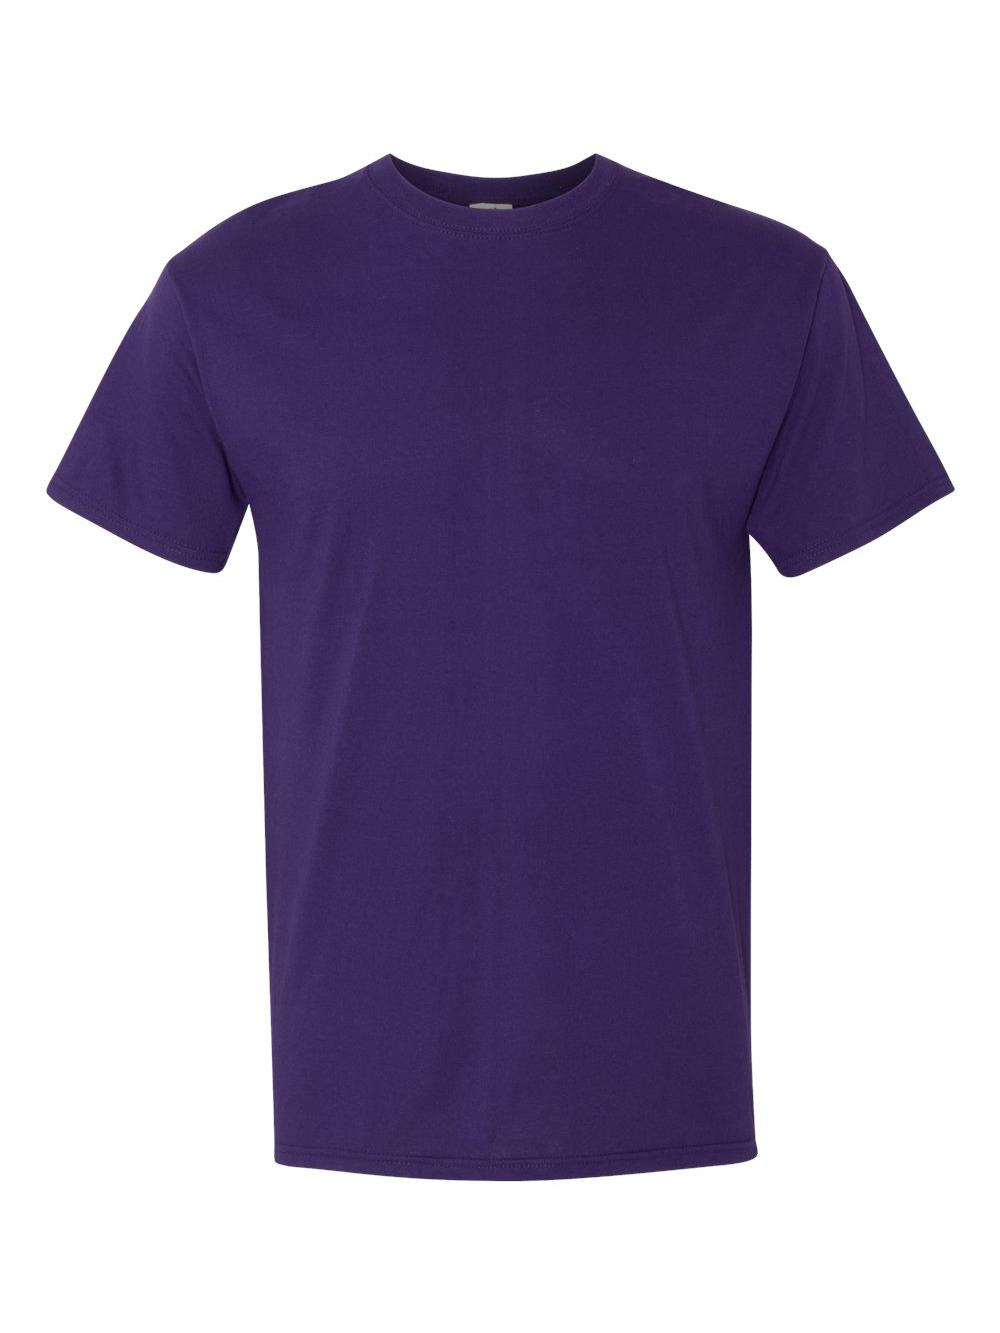 Fruit-of-the-Loom-HD-Cotton-Short-Sleeve-T-Shirt-3930R thumbnail 45